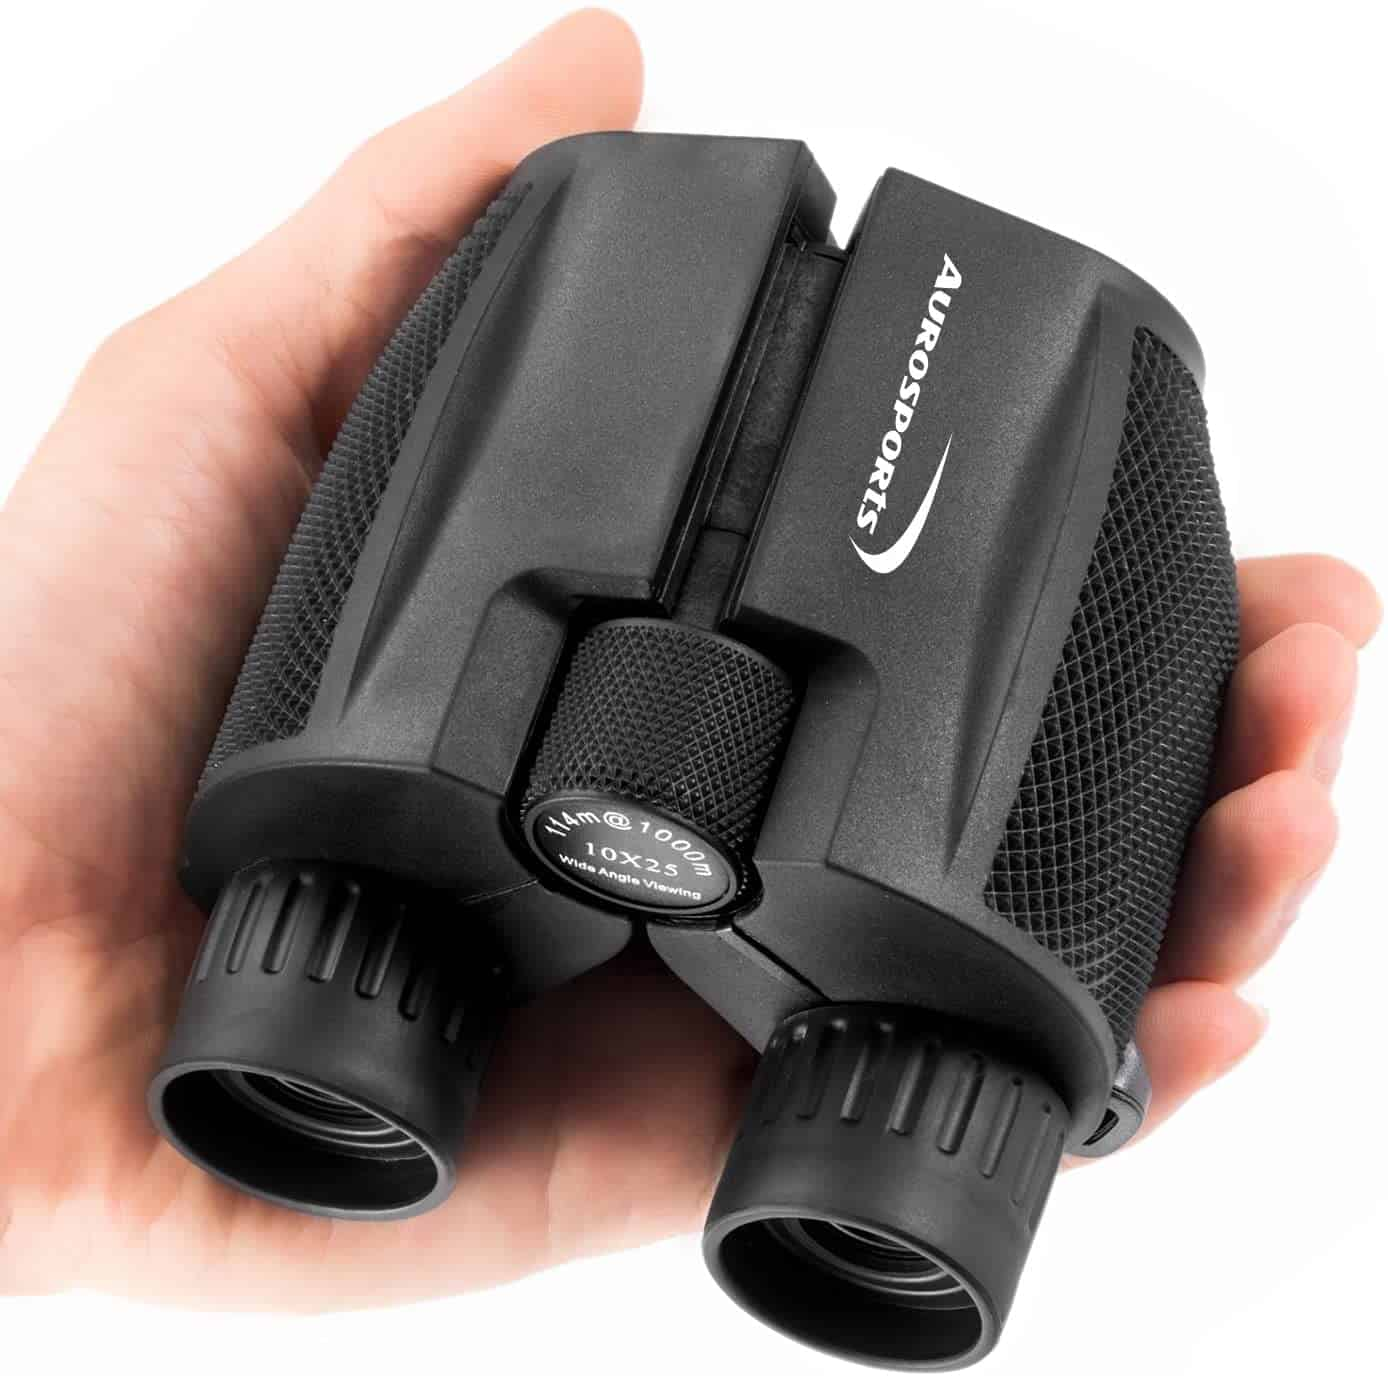 AuroSports 10×25 Compact Binoculars